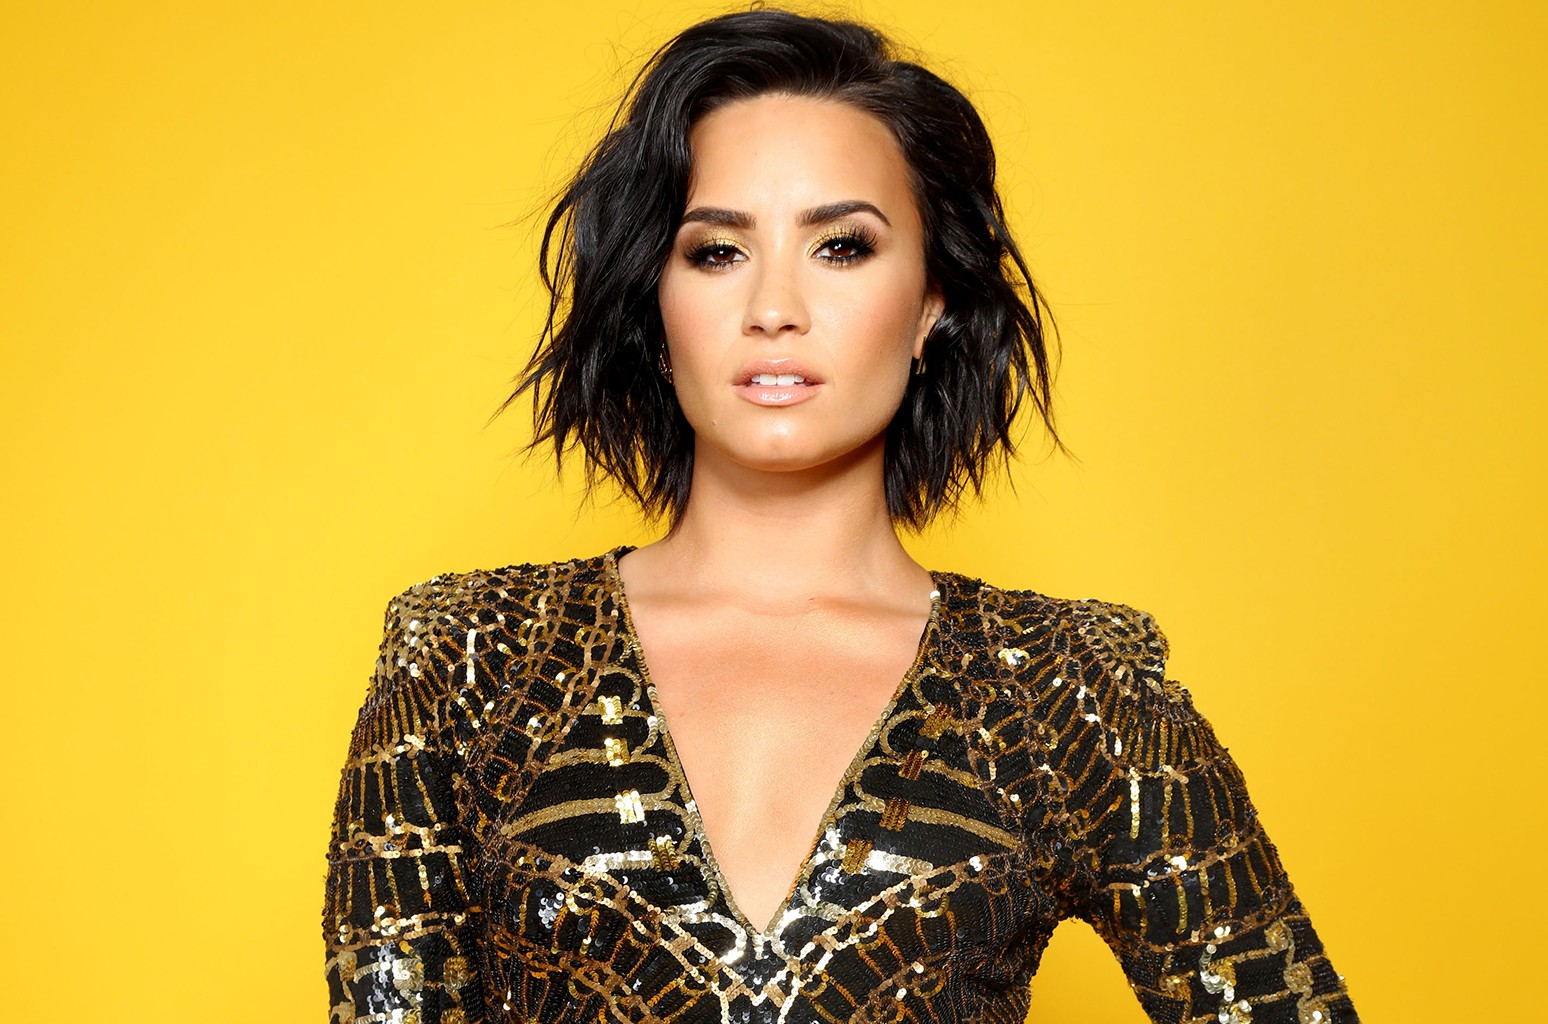 Demi Lovato photographed in 2016